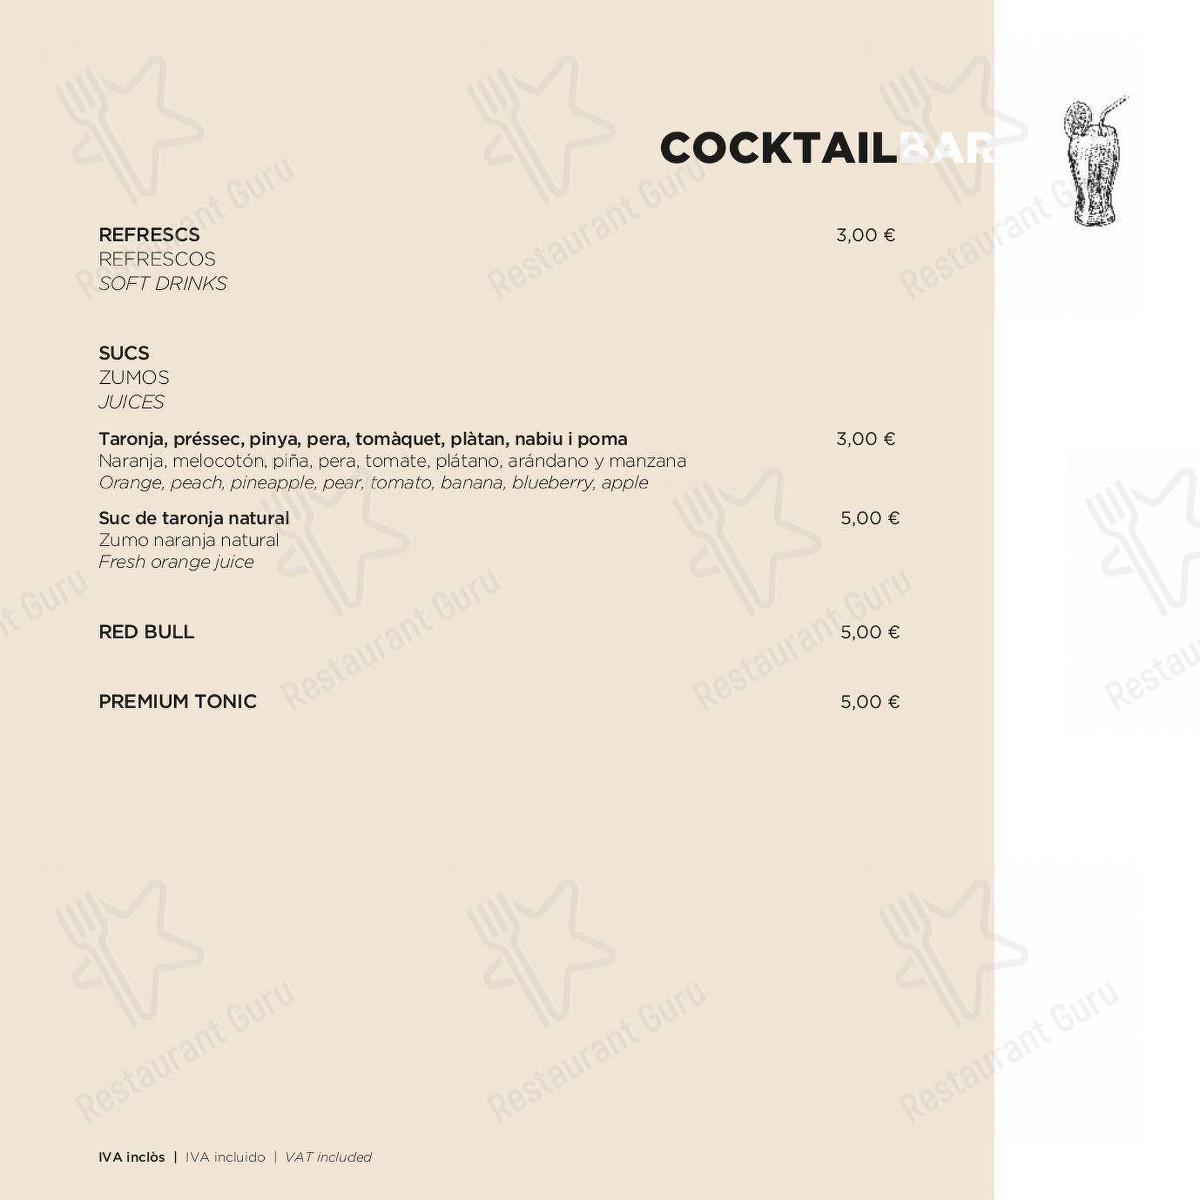 Cocktail Bar menu for ECHO Restaurant in Barcelona